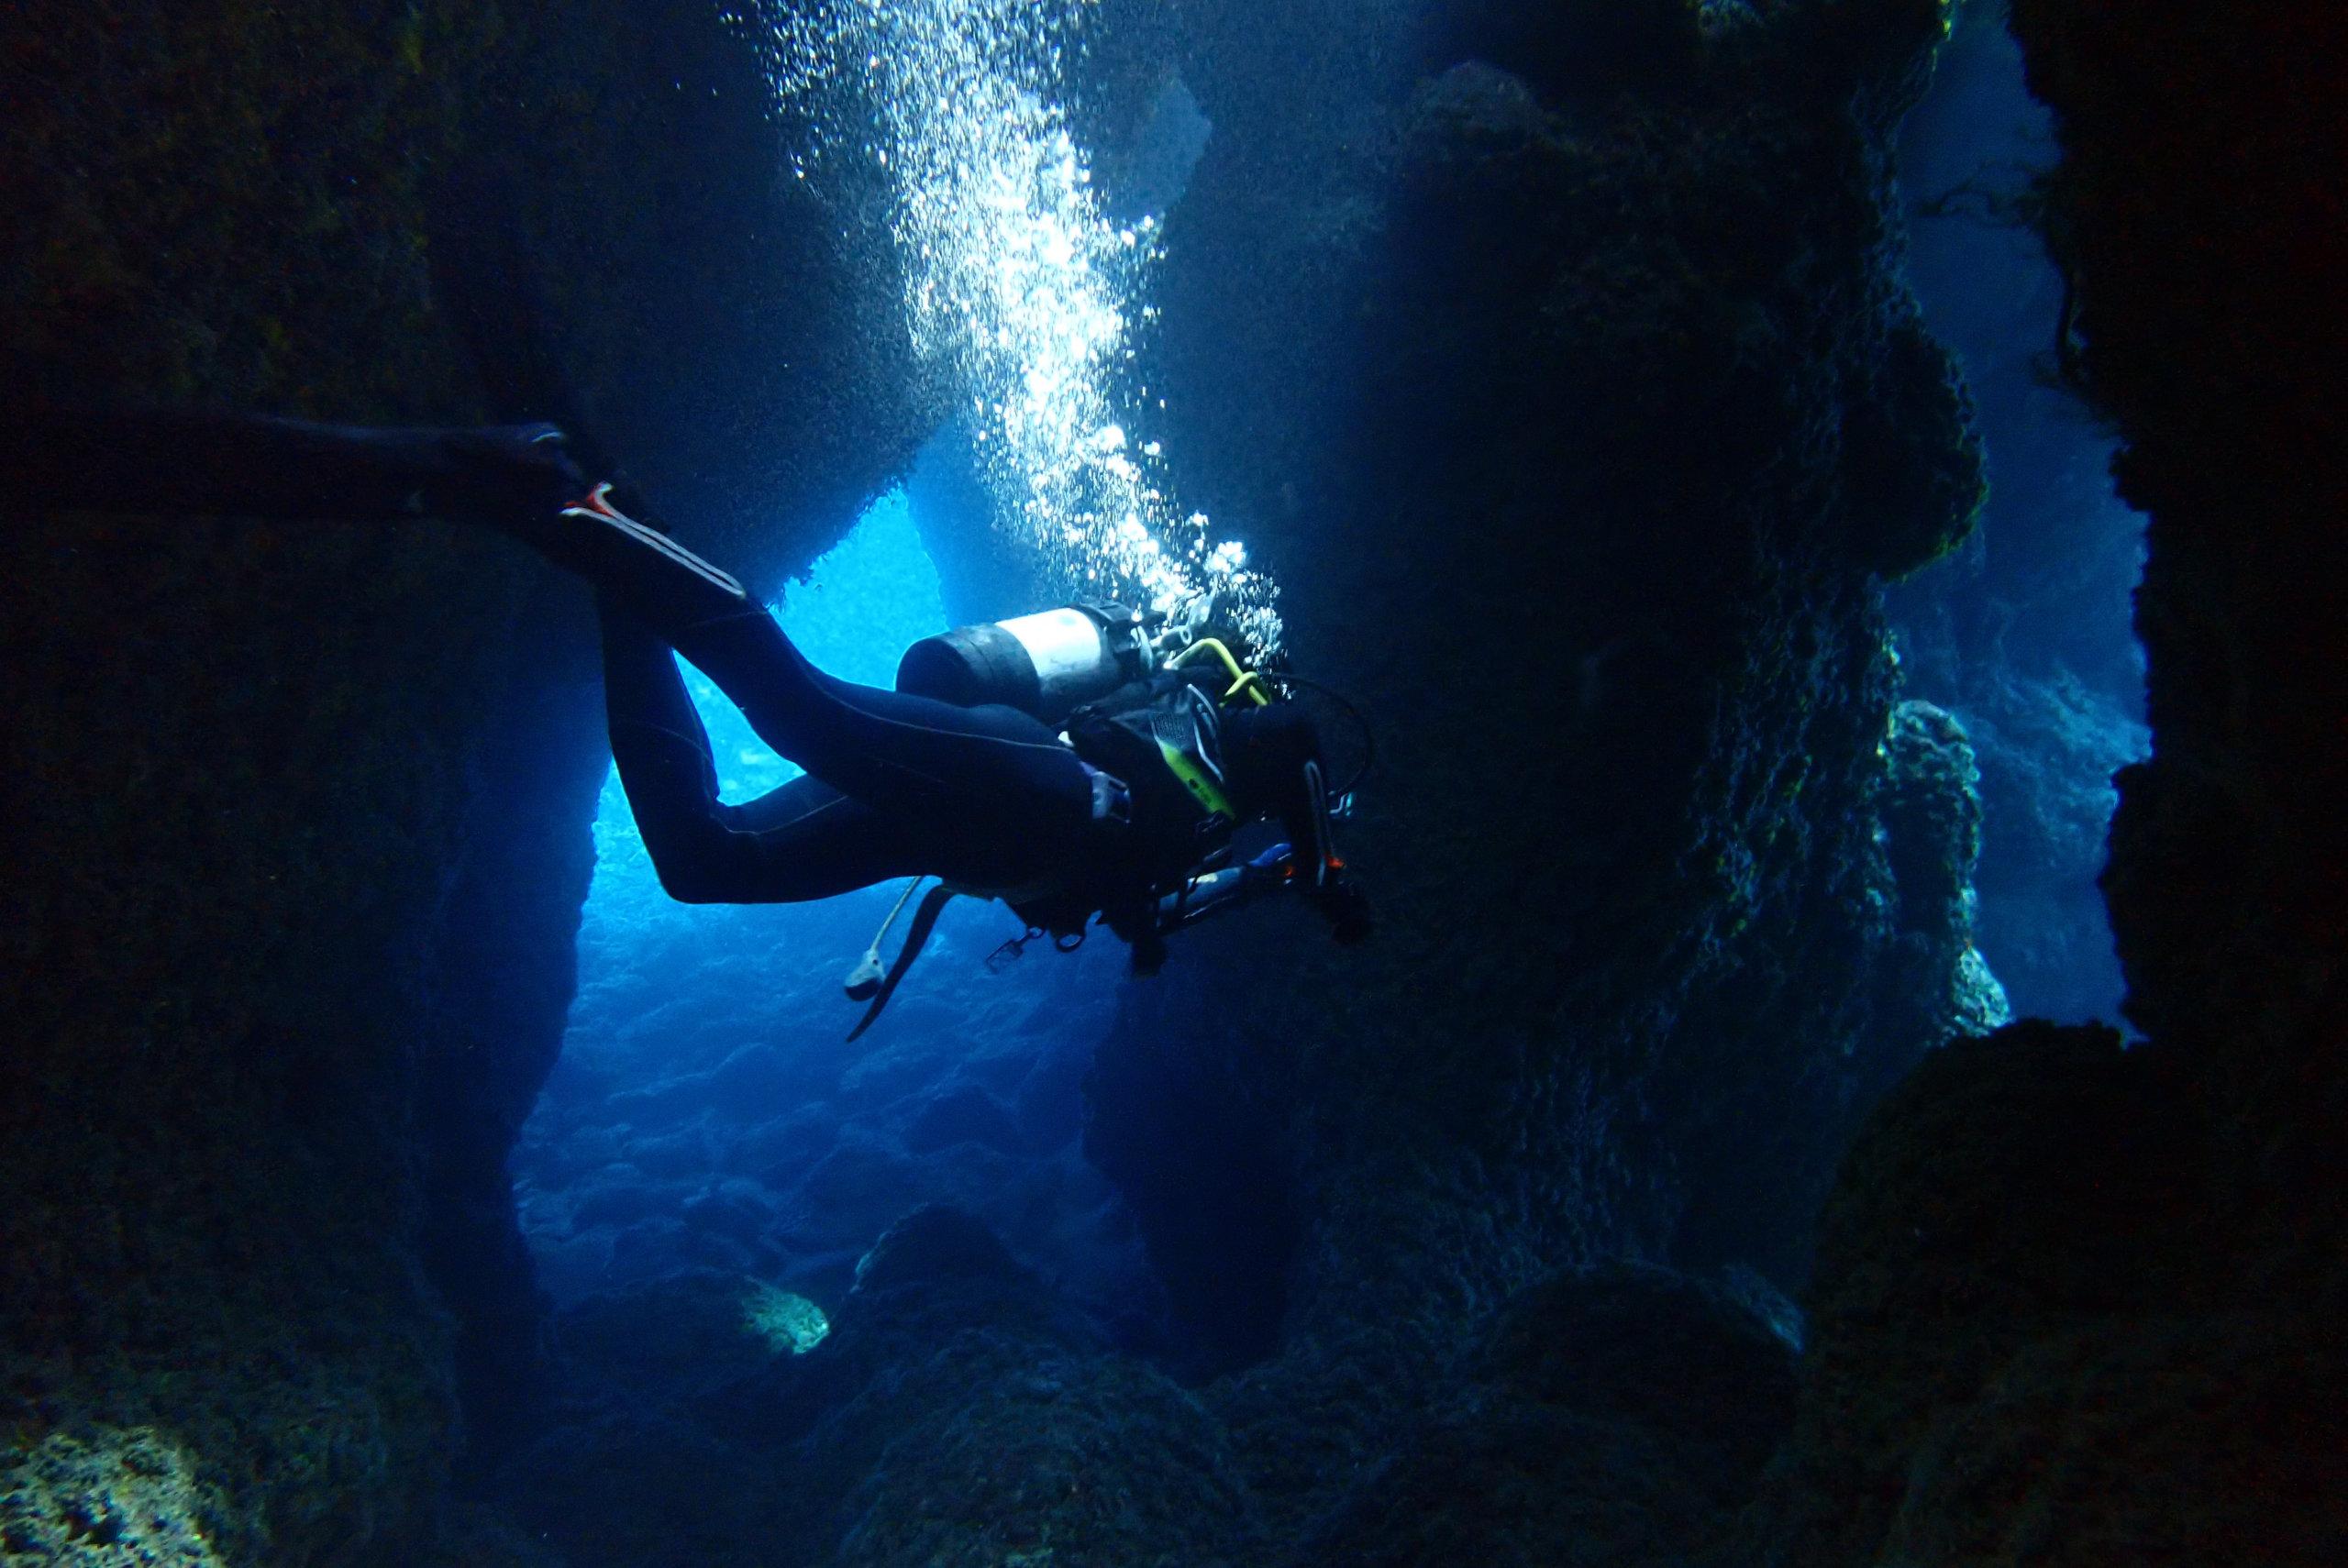 水中洞窟を探検